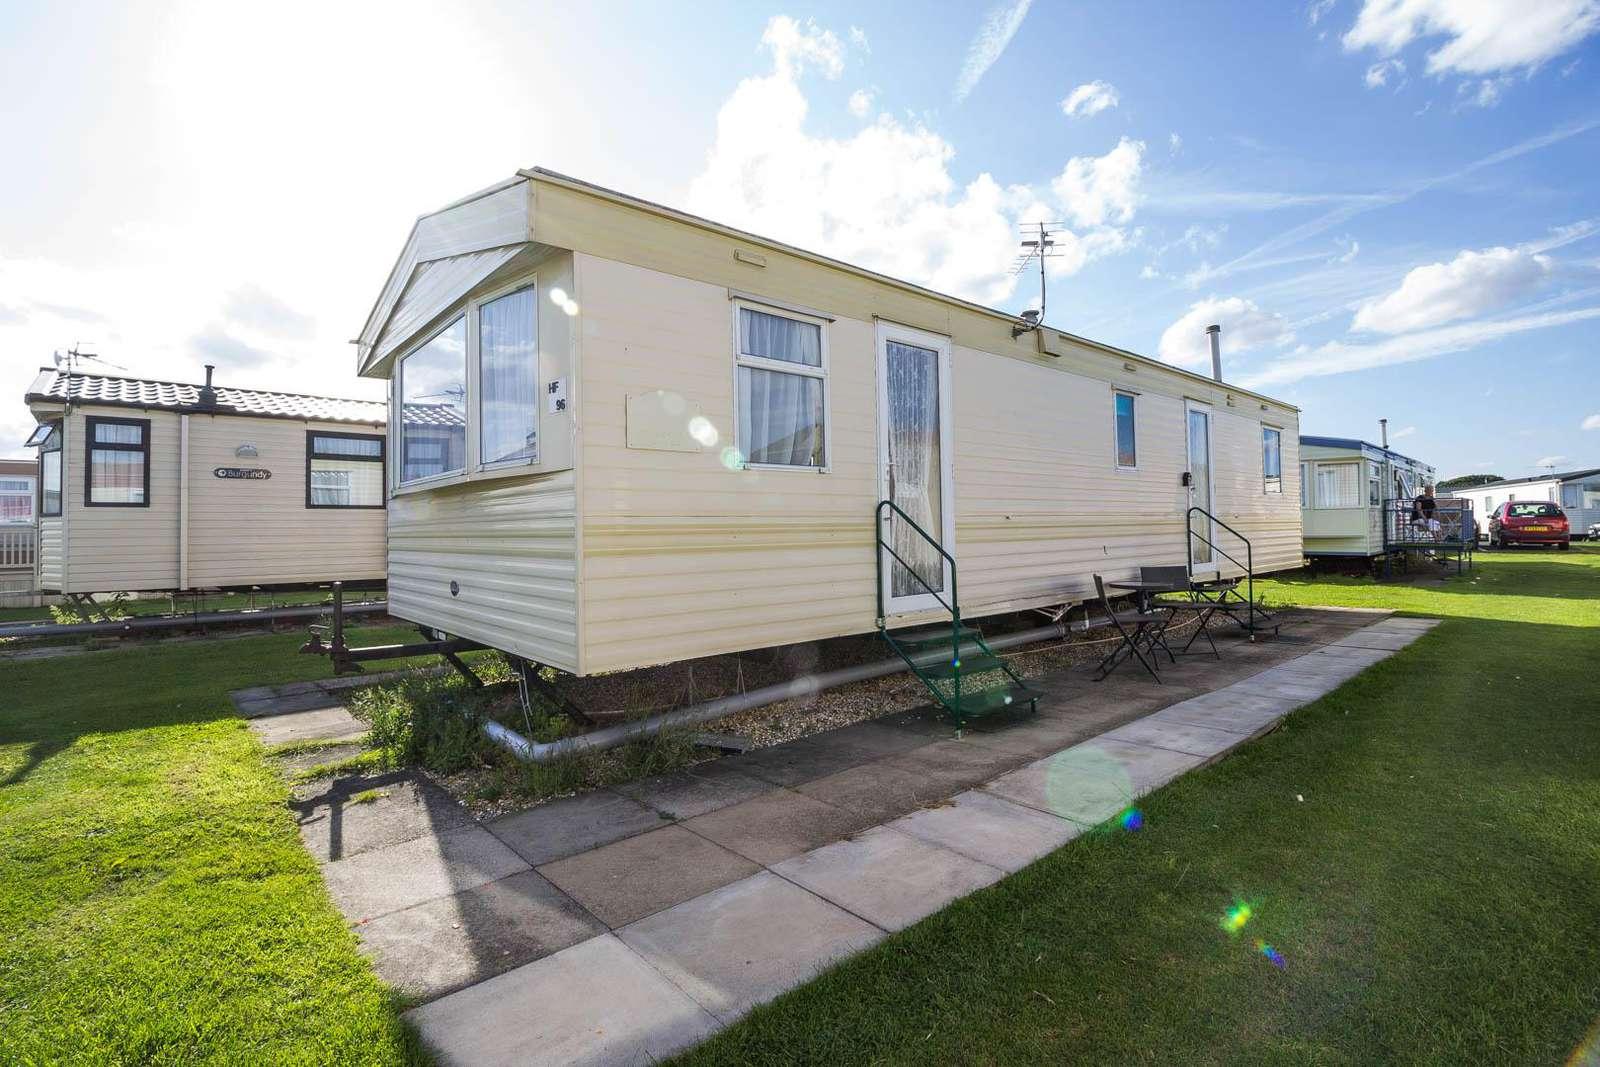 64096HF – Hadrian's Field, 3 bed, 8 berth caravan. Emerald rated. - property